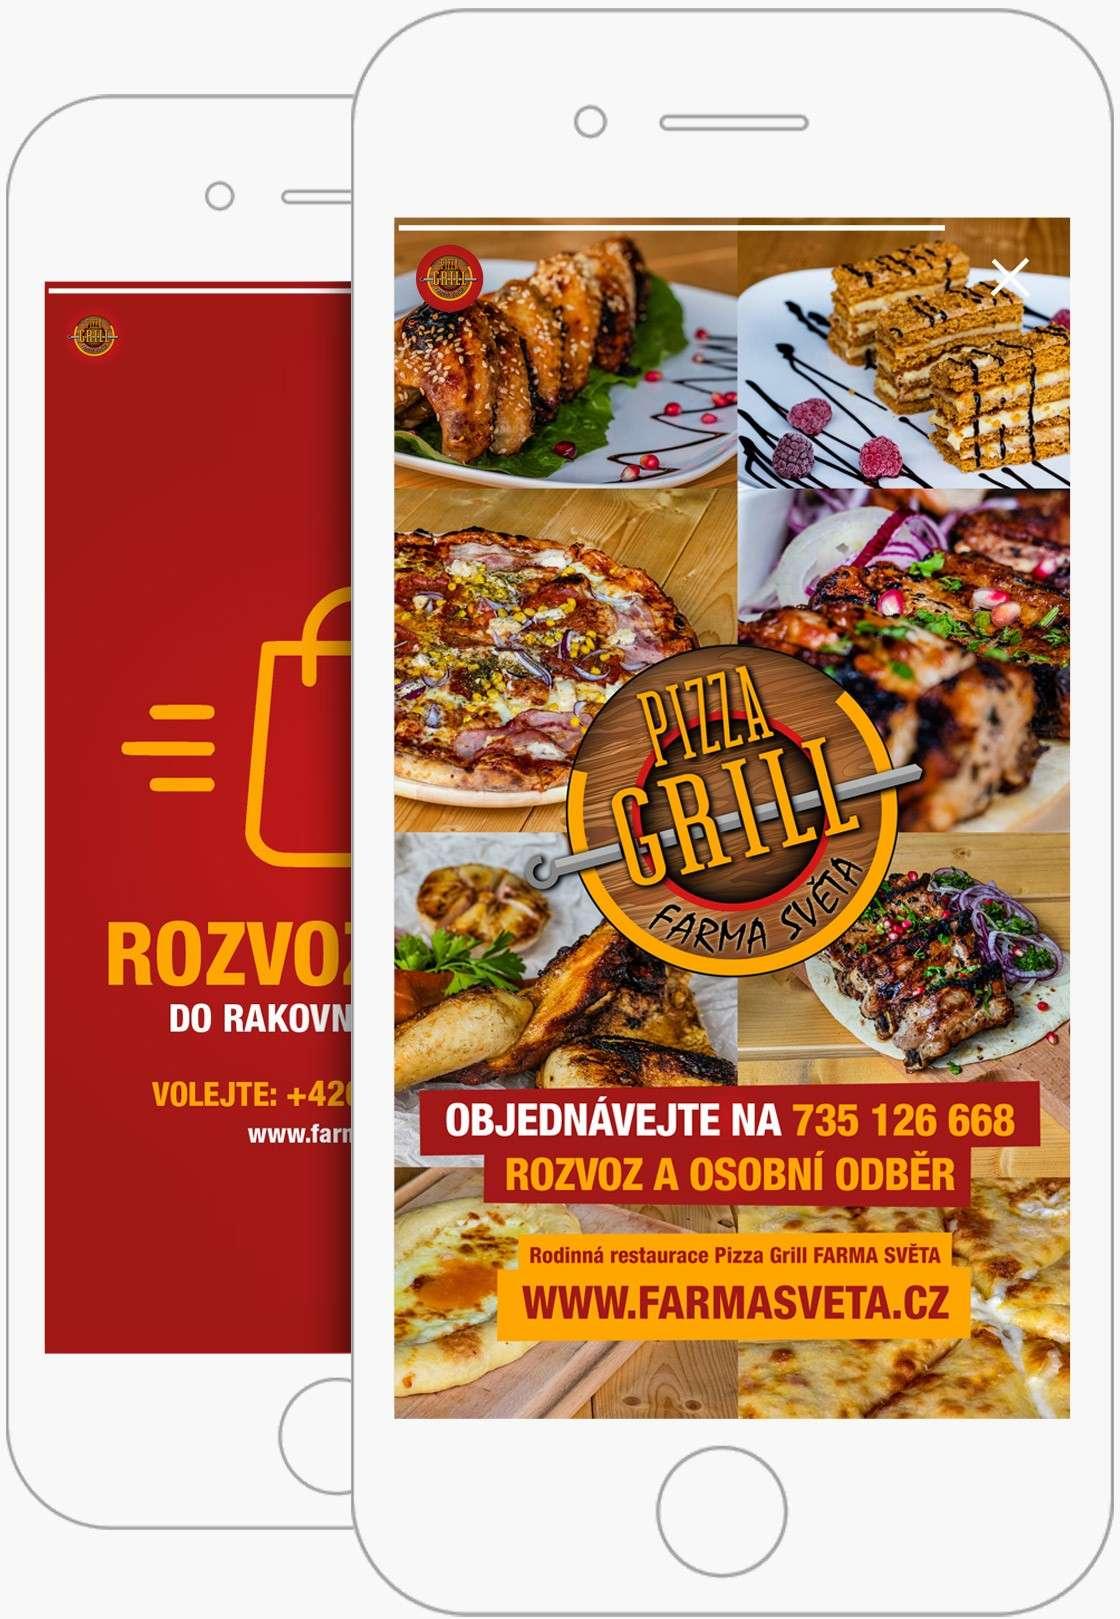 clubadvisor_reference_pizzagrillfarmasveta_on-line-marketing_instagram